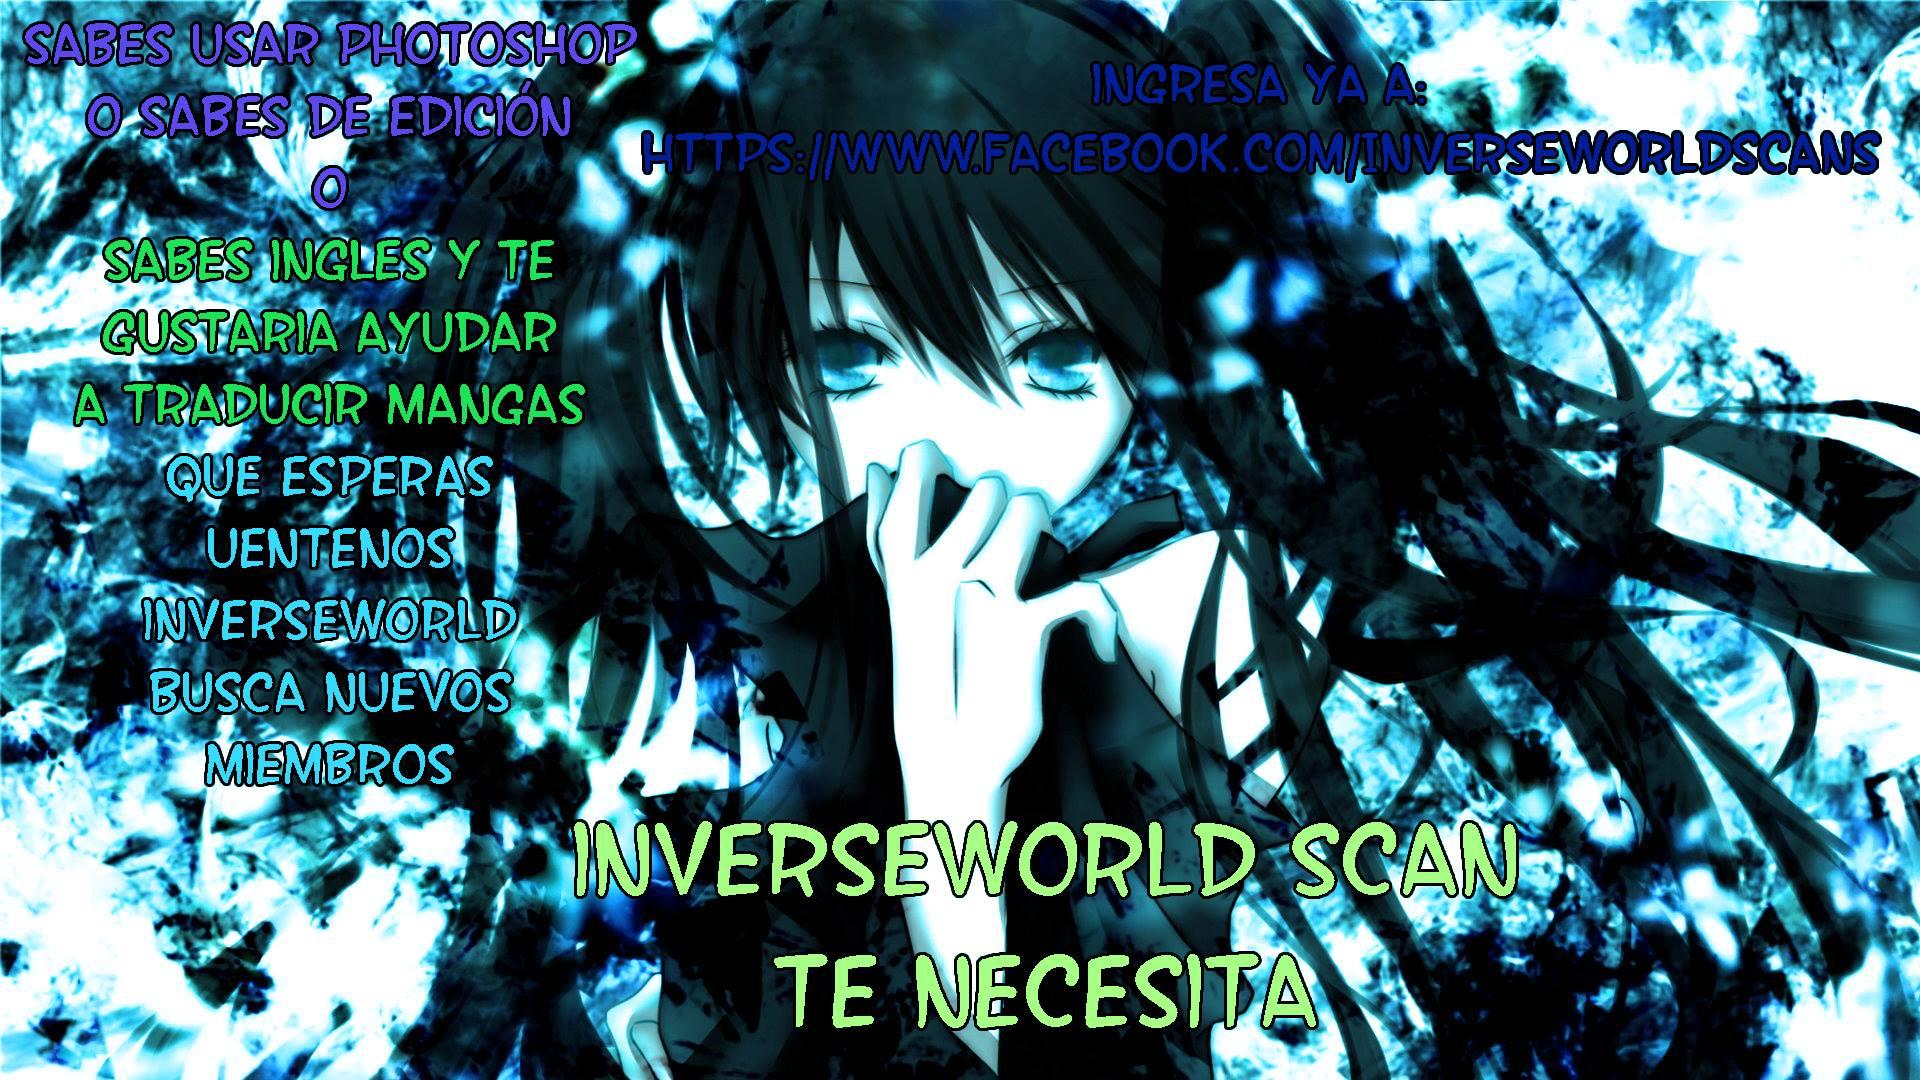 http://c5.ninemanga.com/es_manga/18/16210/415301/b48c62590e6d0cda7b99d3c4053a412b.jpg Page 1